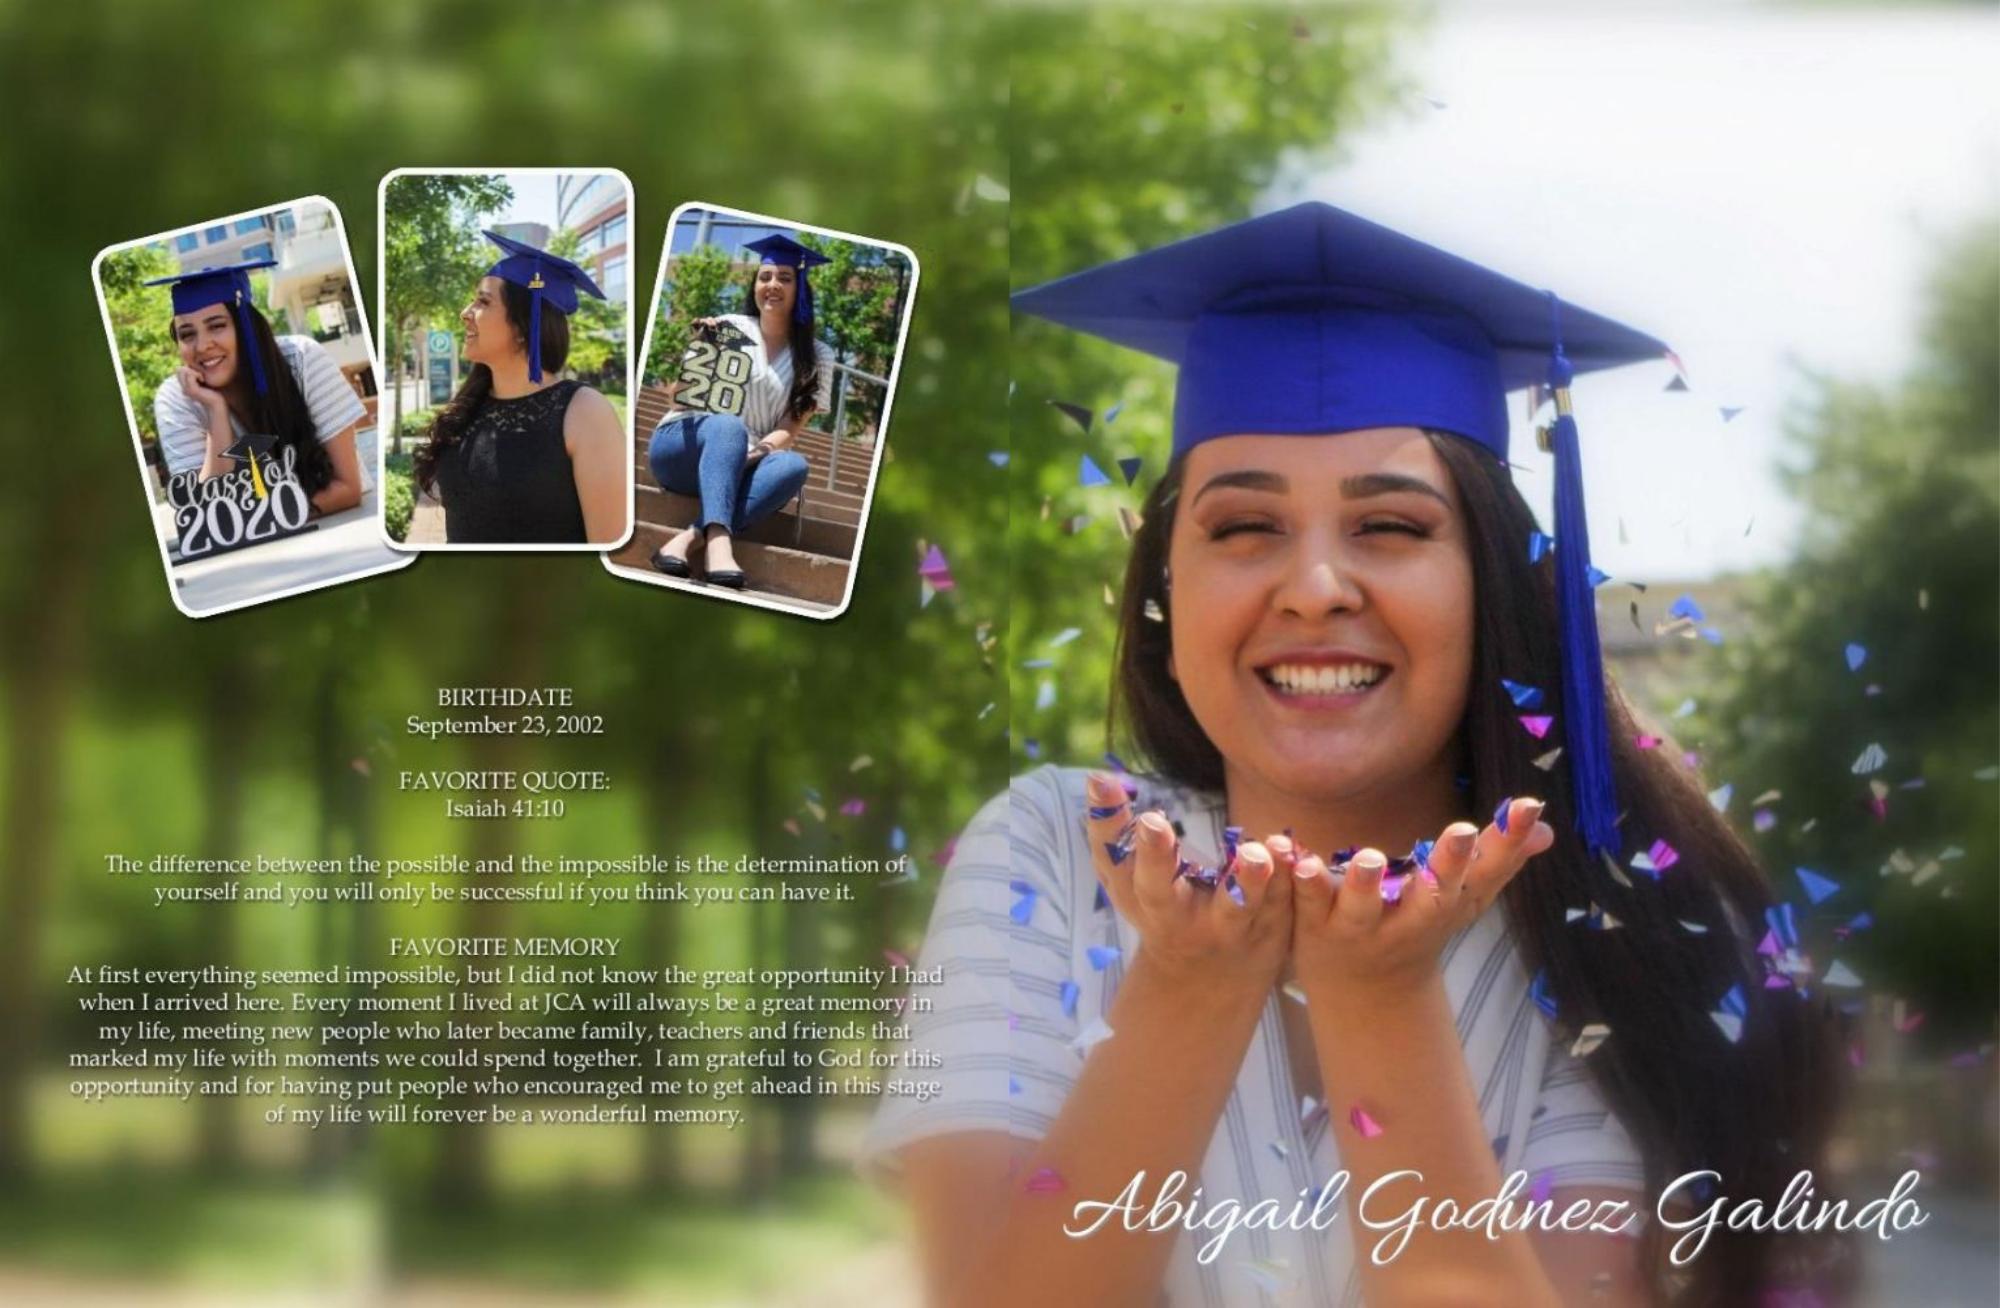 Galindo, Abigail